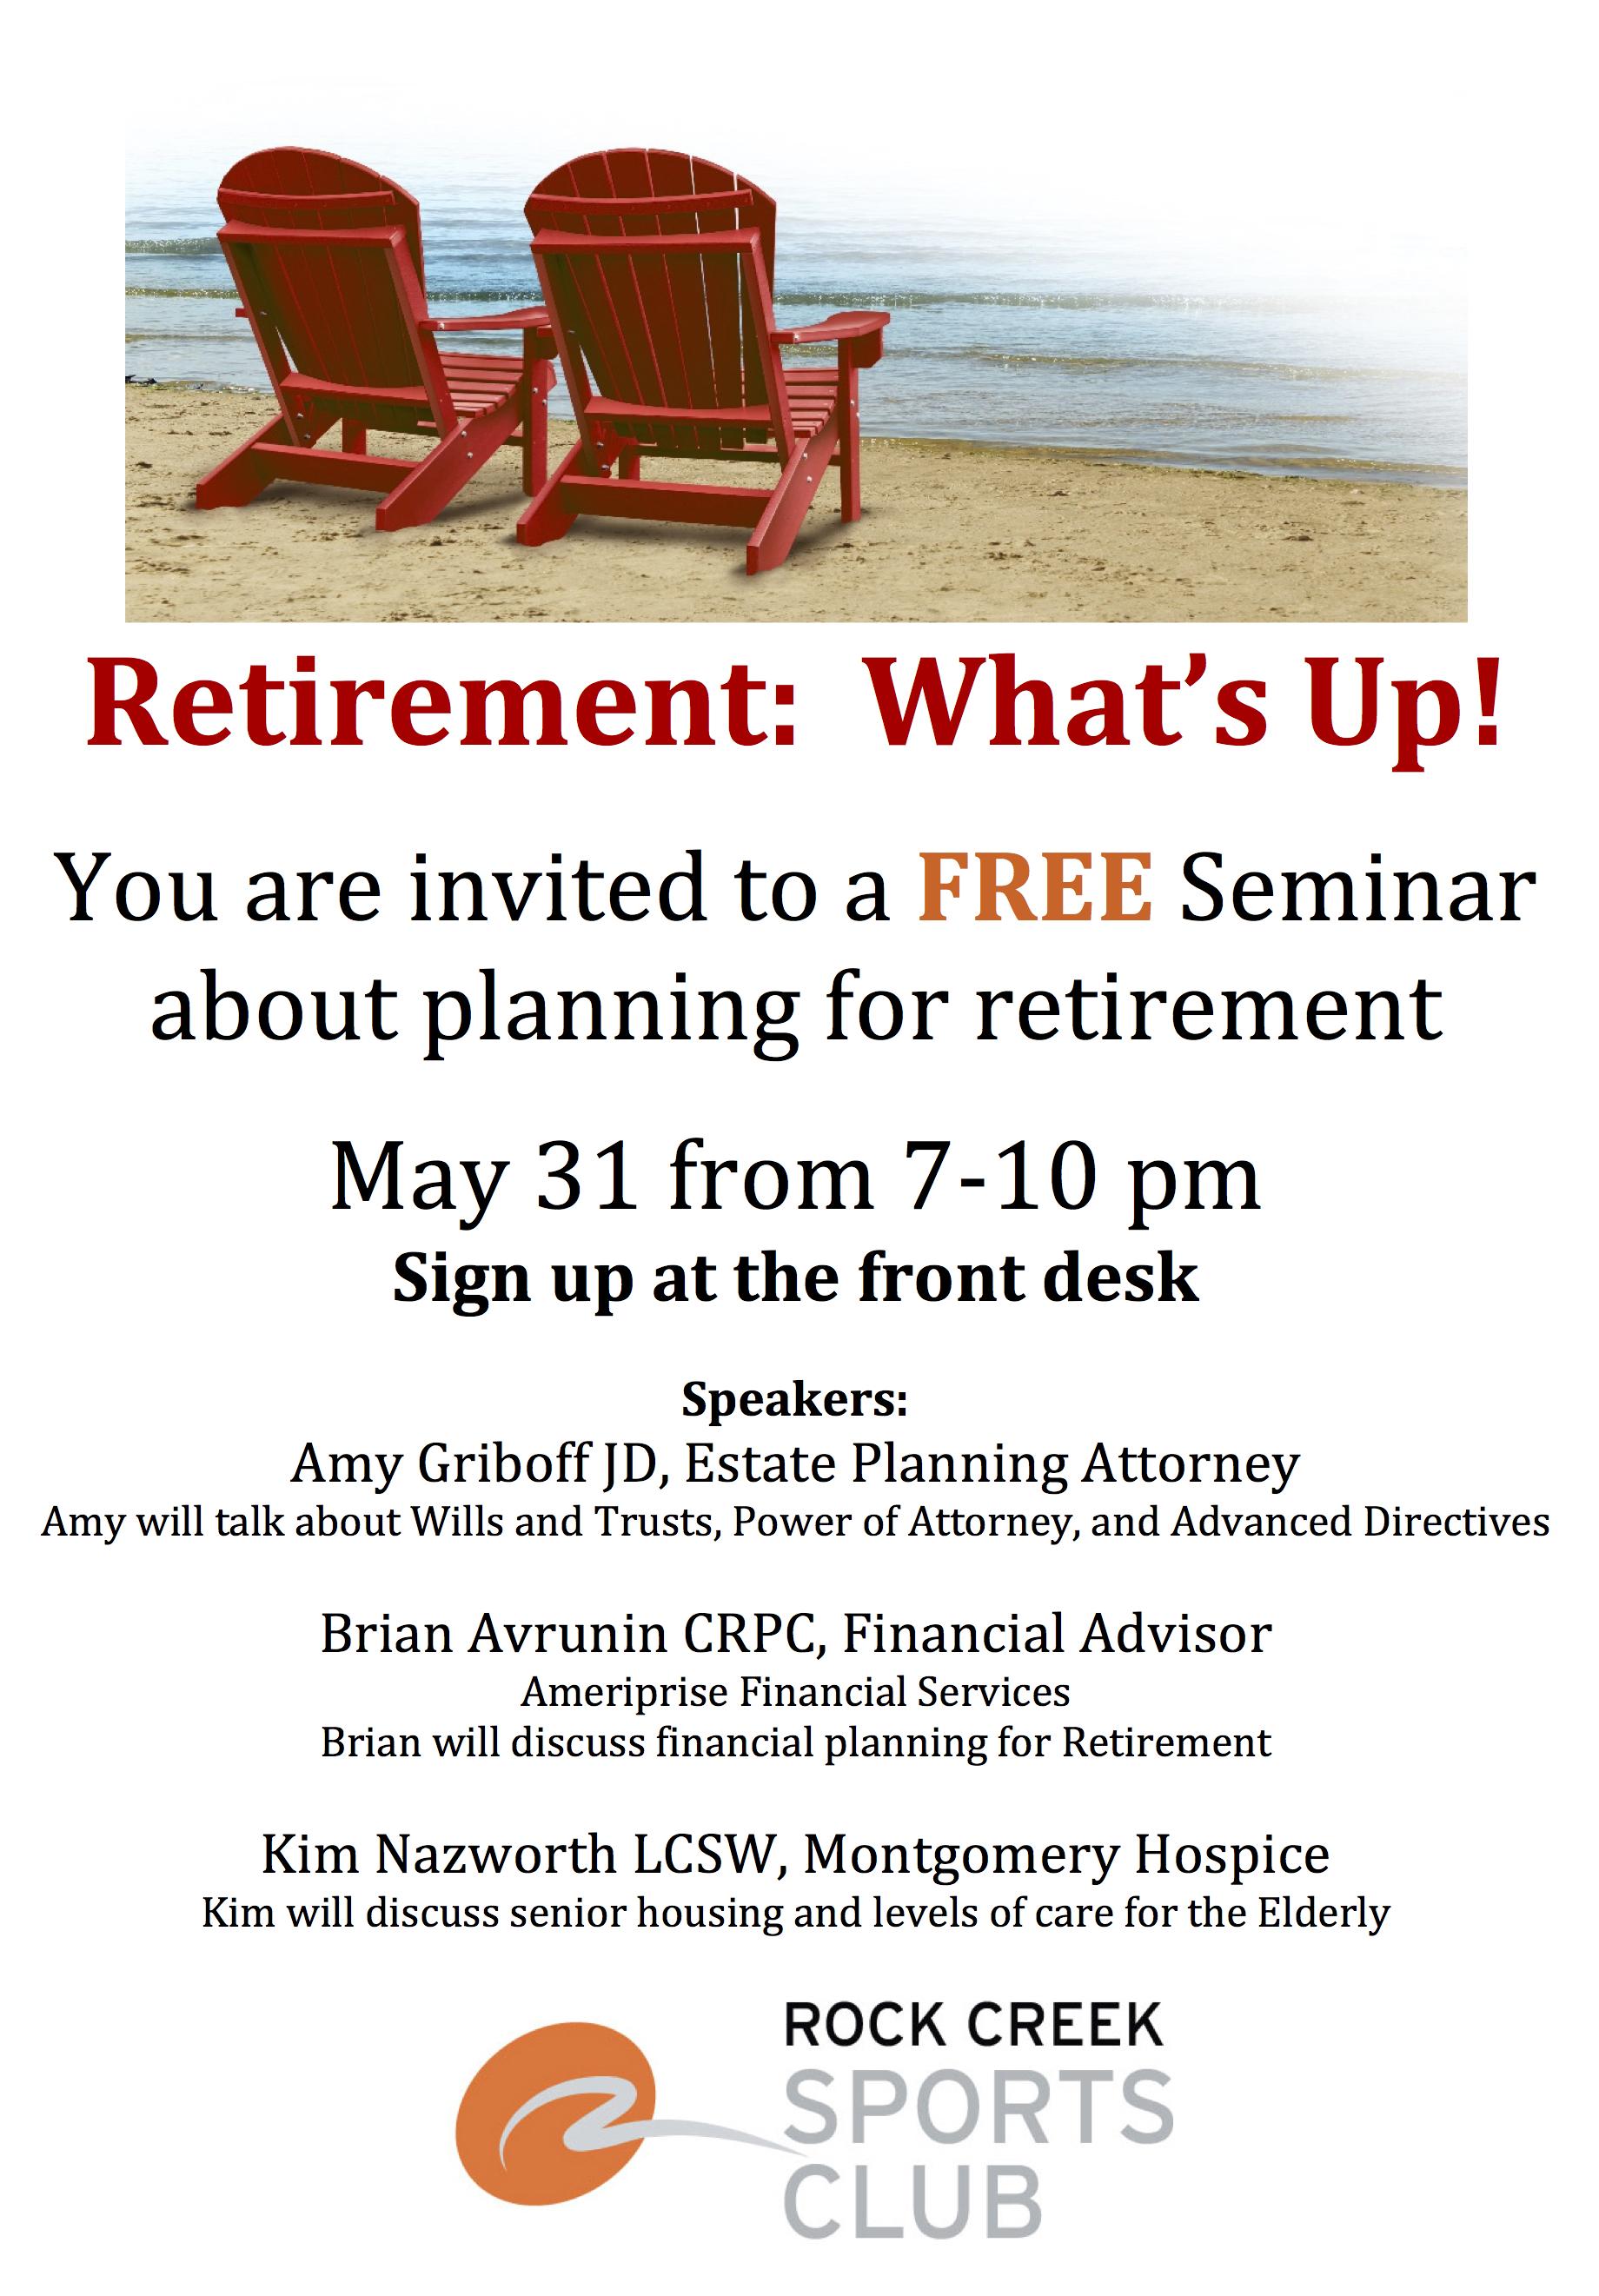 Planning for Retirement flyer copy